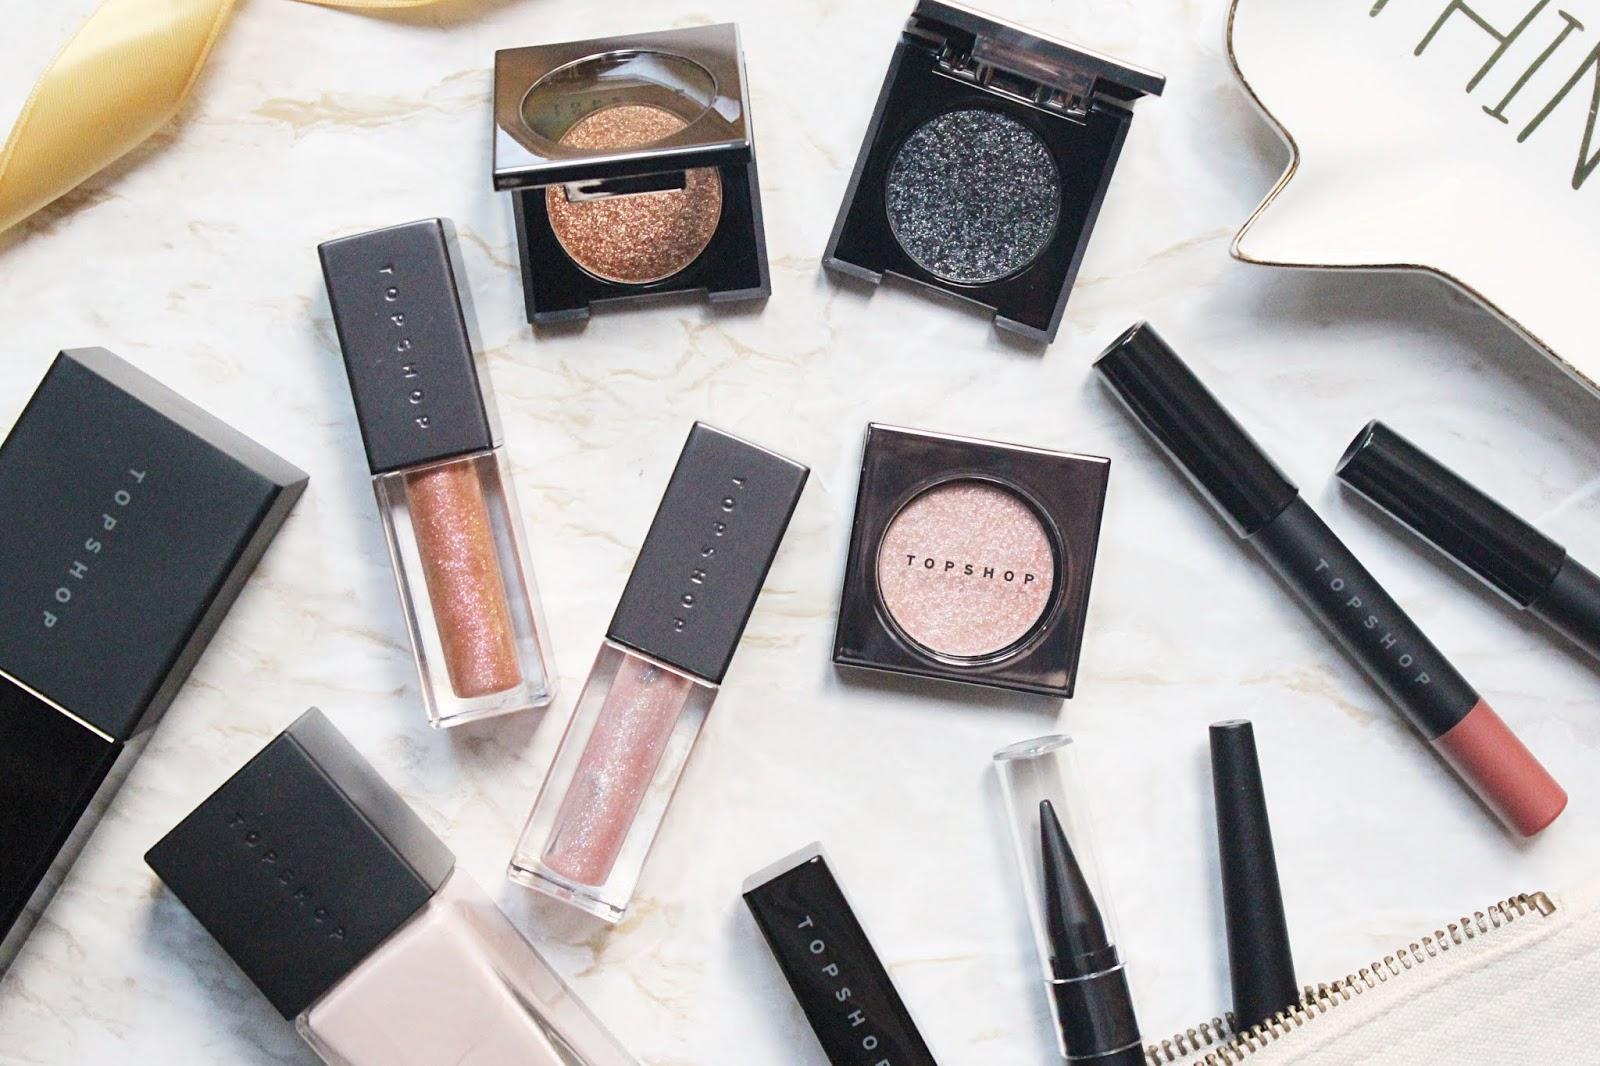 Topshop Makeup Haul